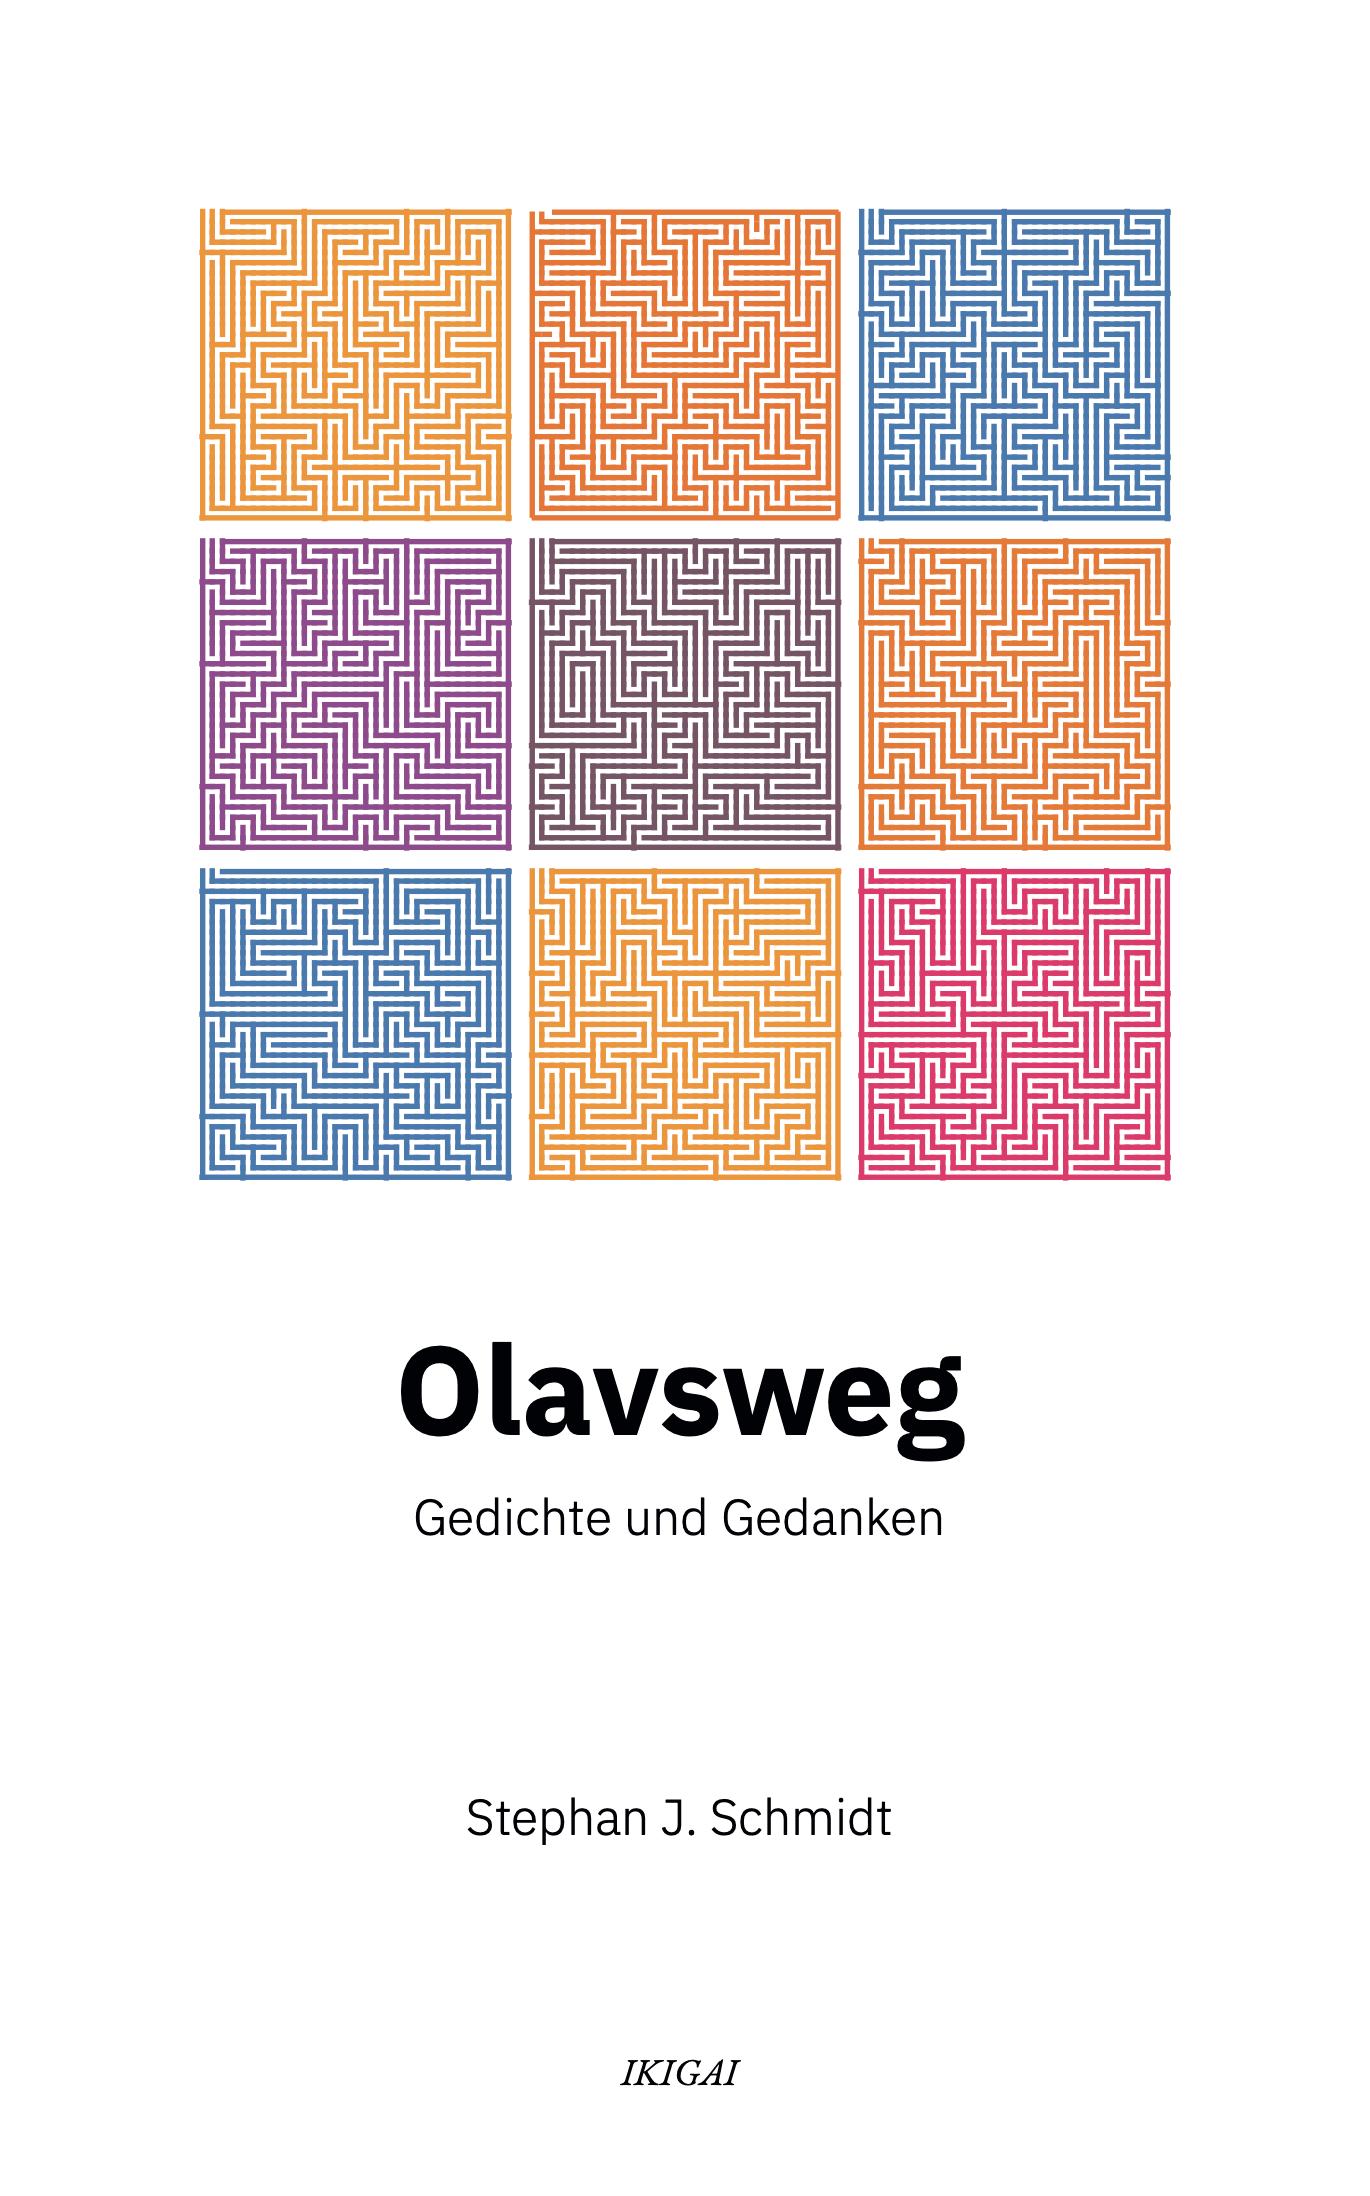 Olafsweg Gedichte und Lyrik Buch